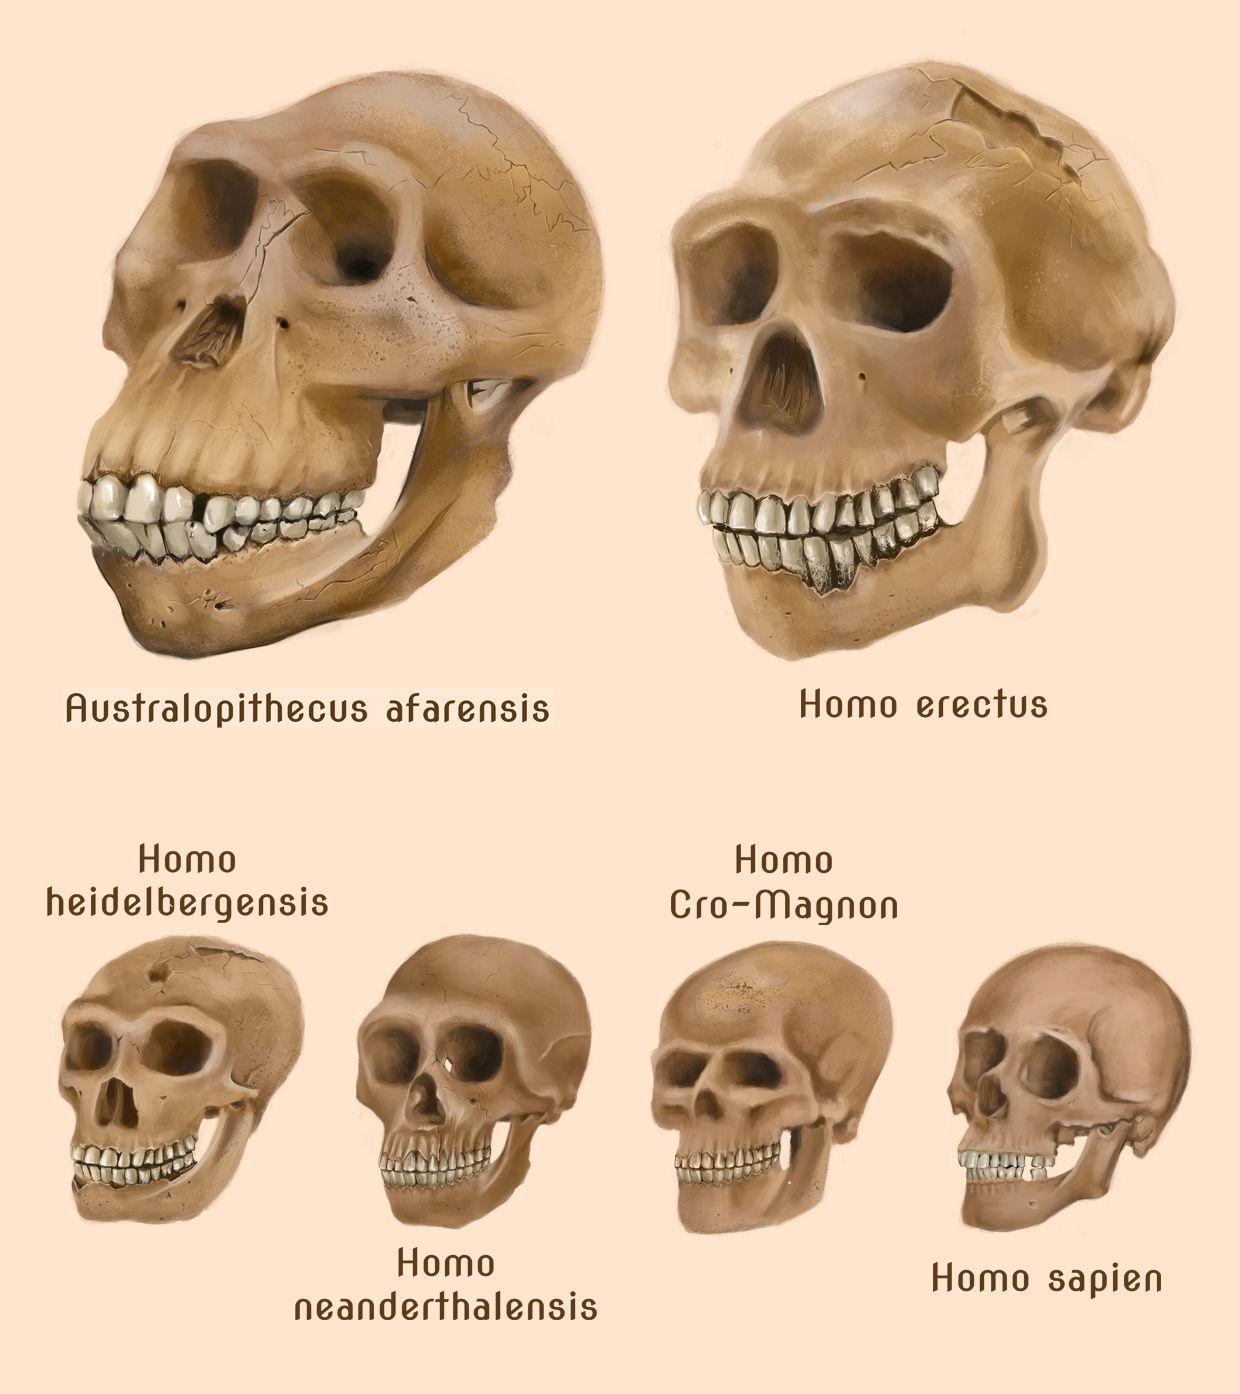 Brain Size C Anthropology C Early Humans C Human Evolution C Brain Size